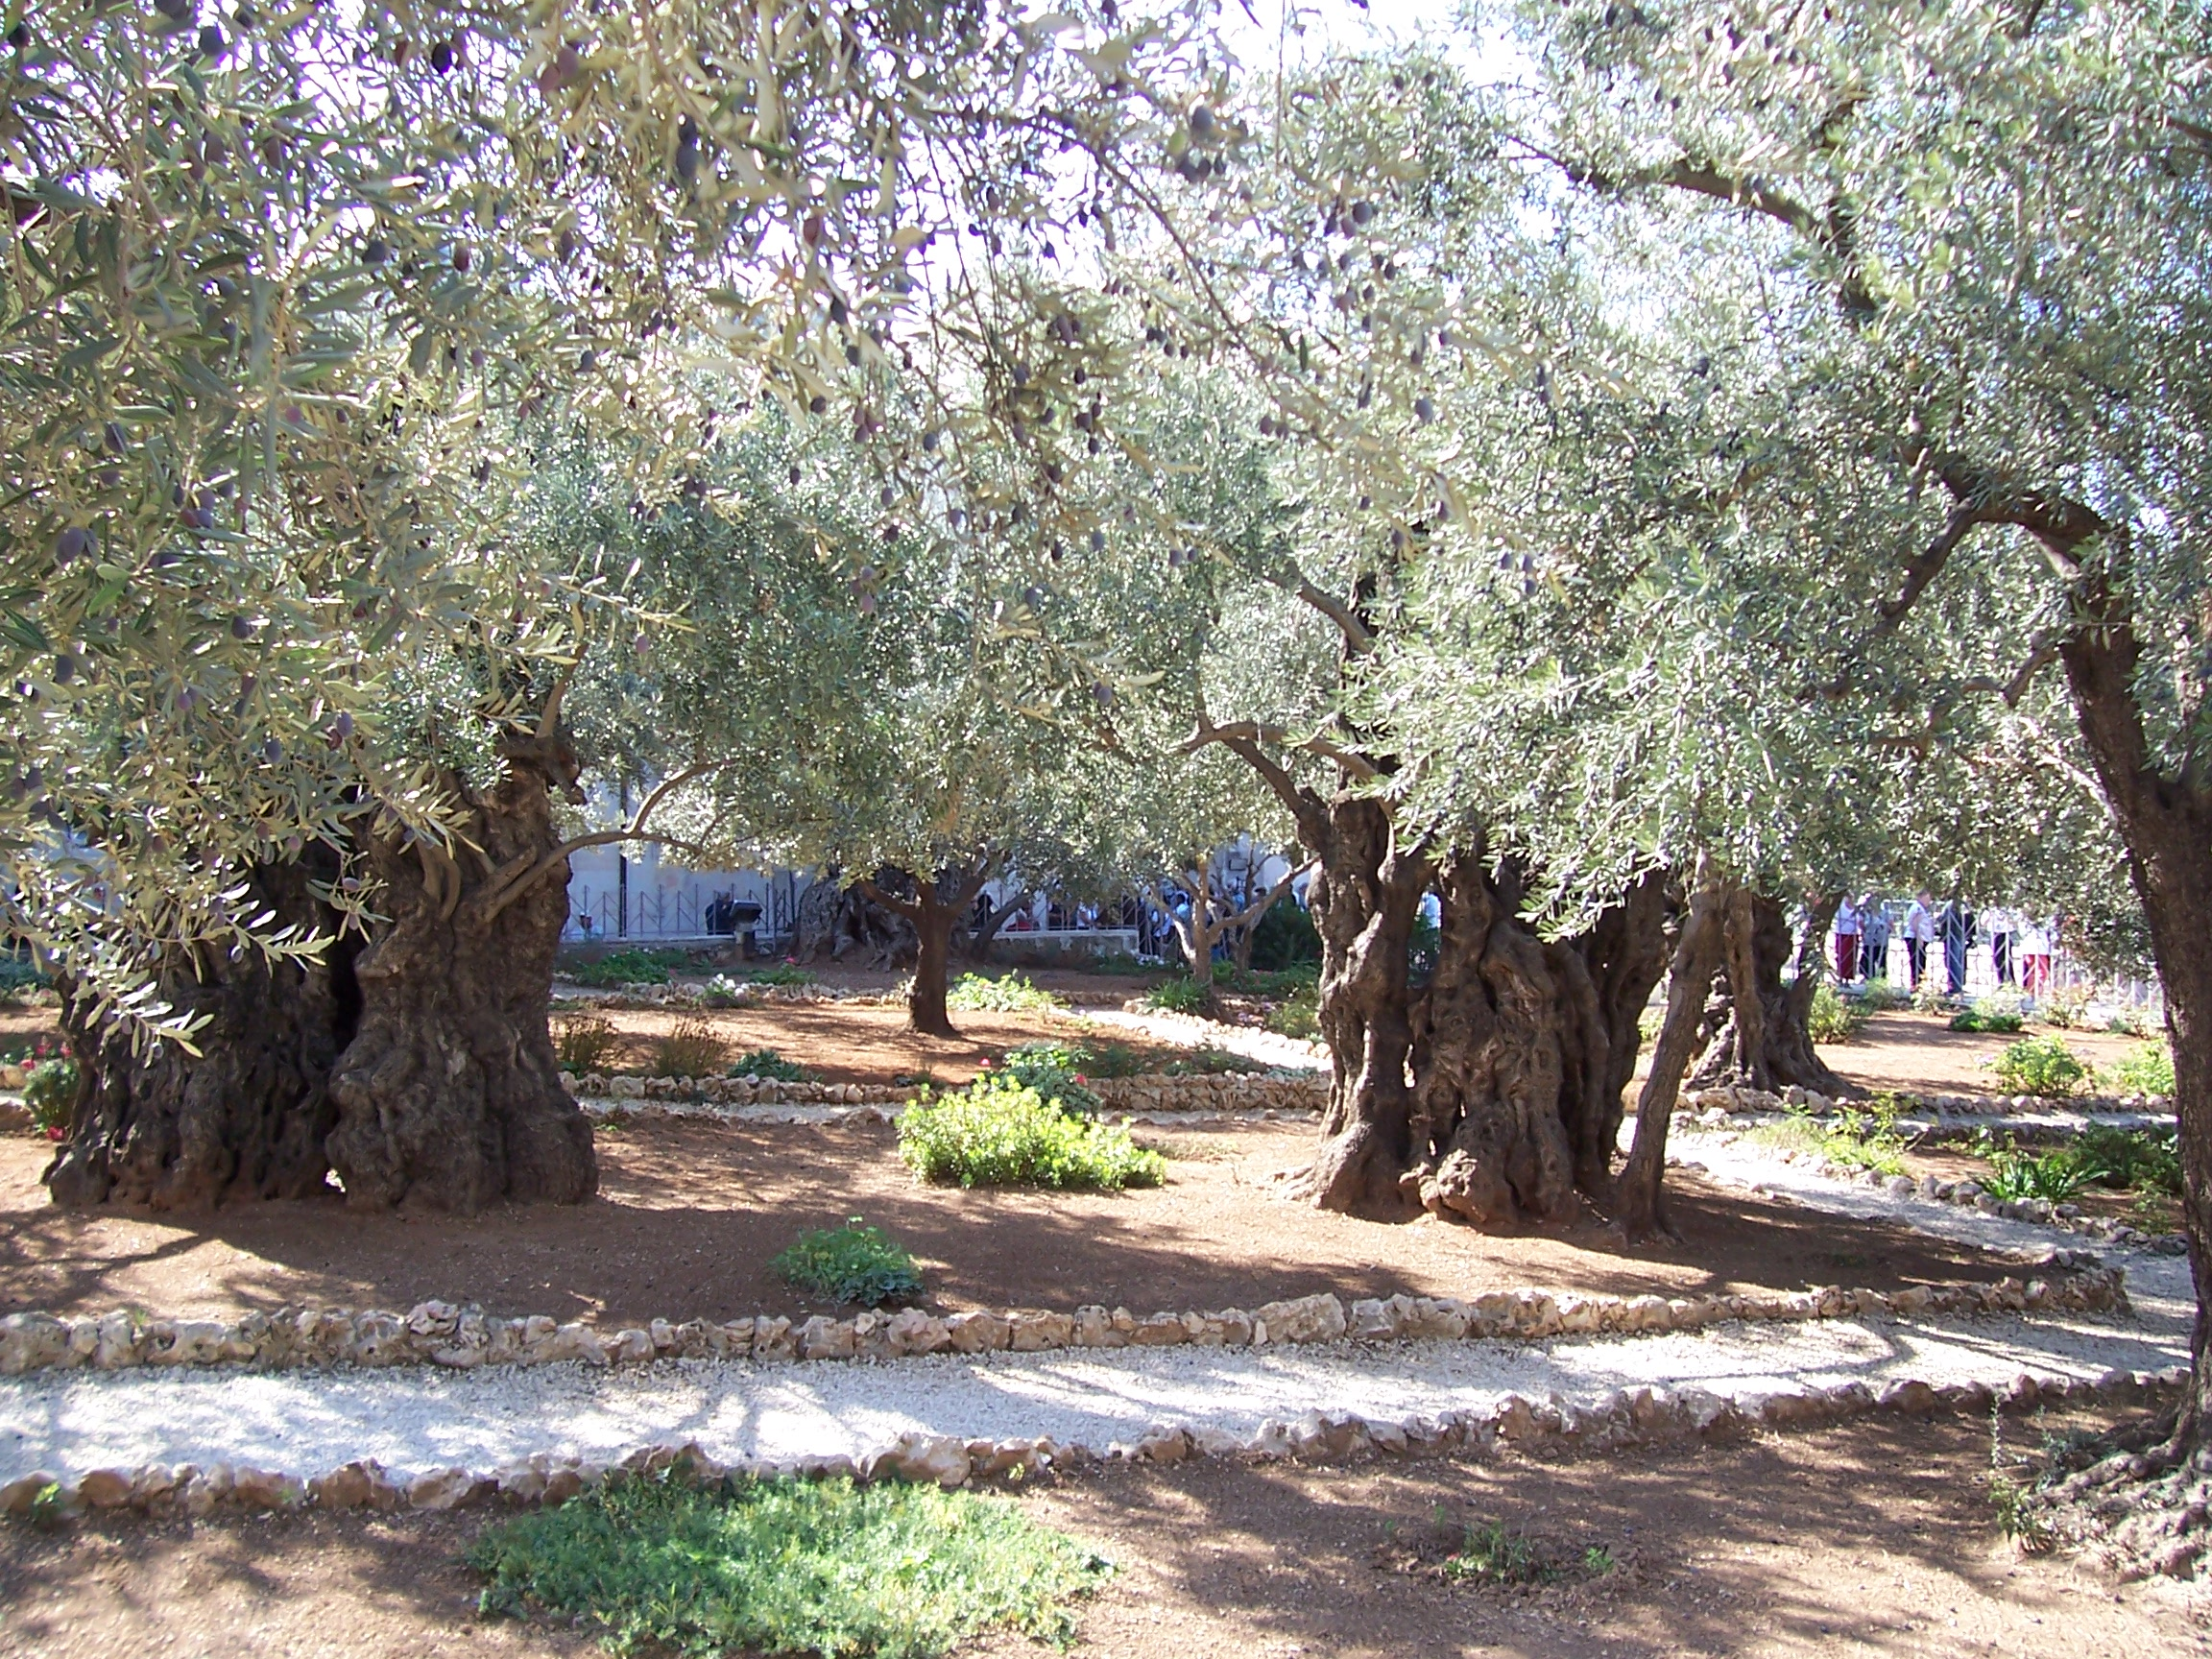 EDH_0517 - Gethsemane.JPG